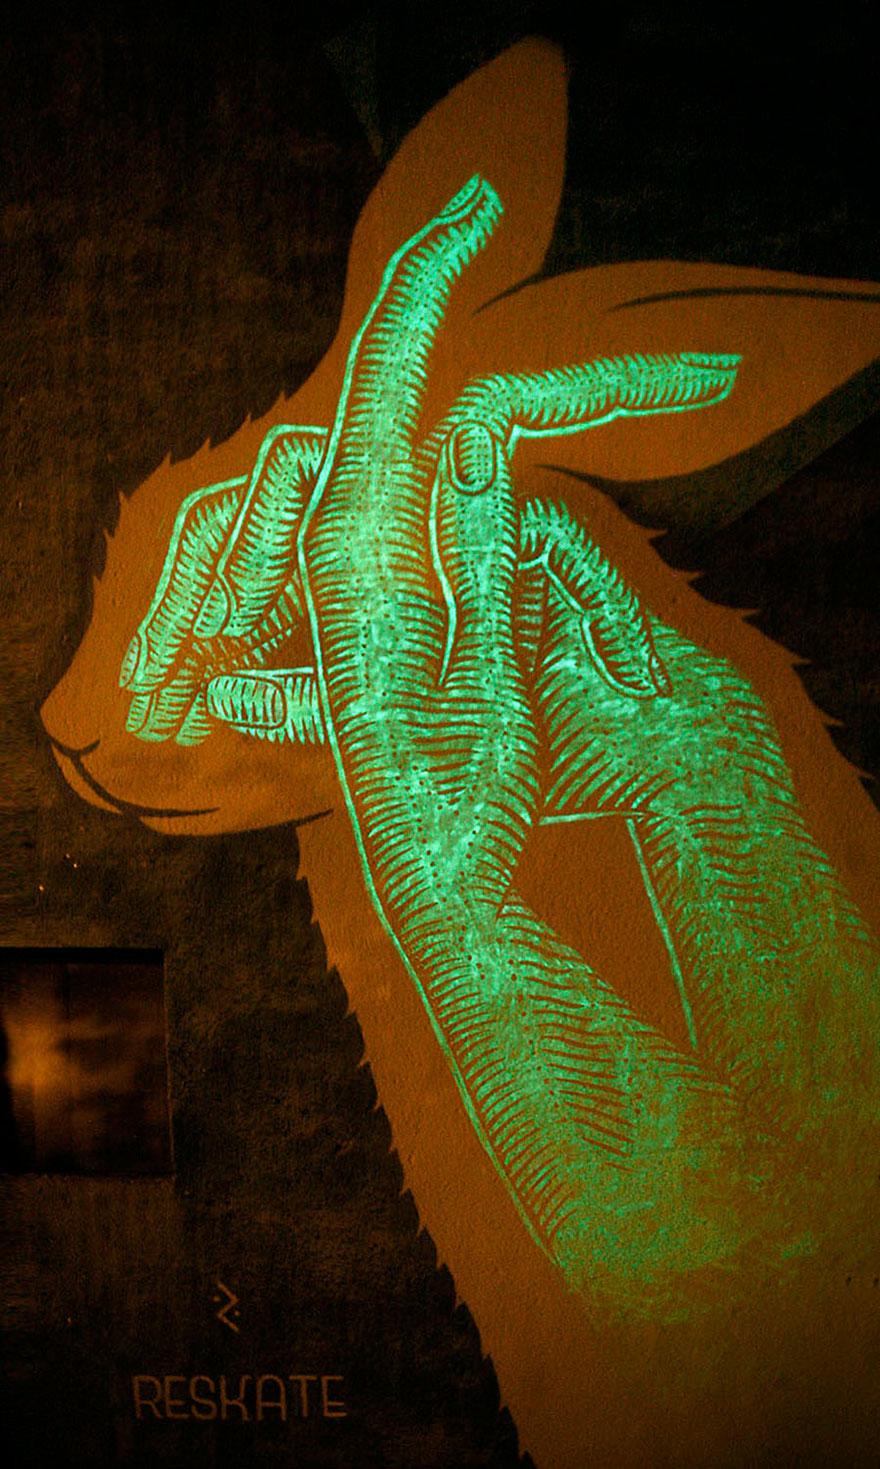 glow-in-the-dark-murals-reskate-studio-10